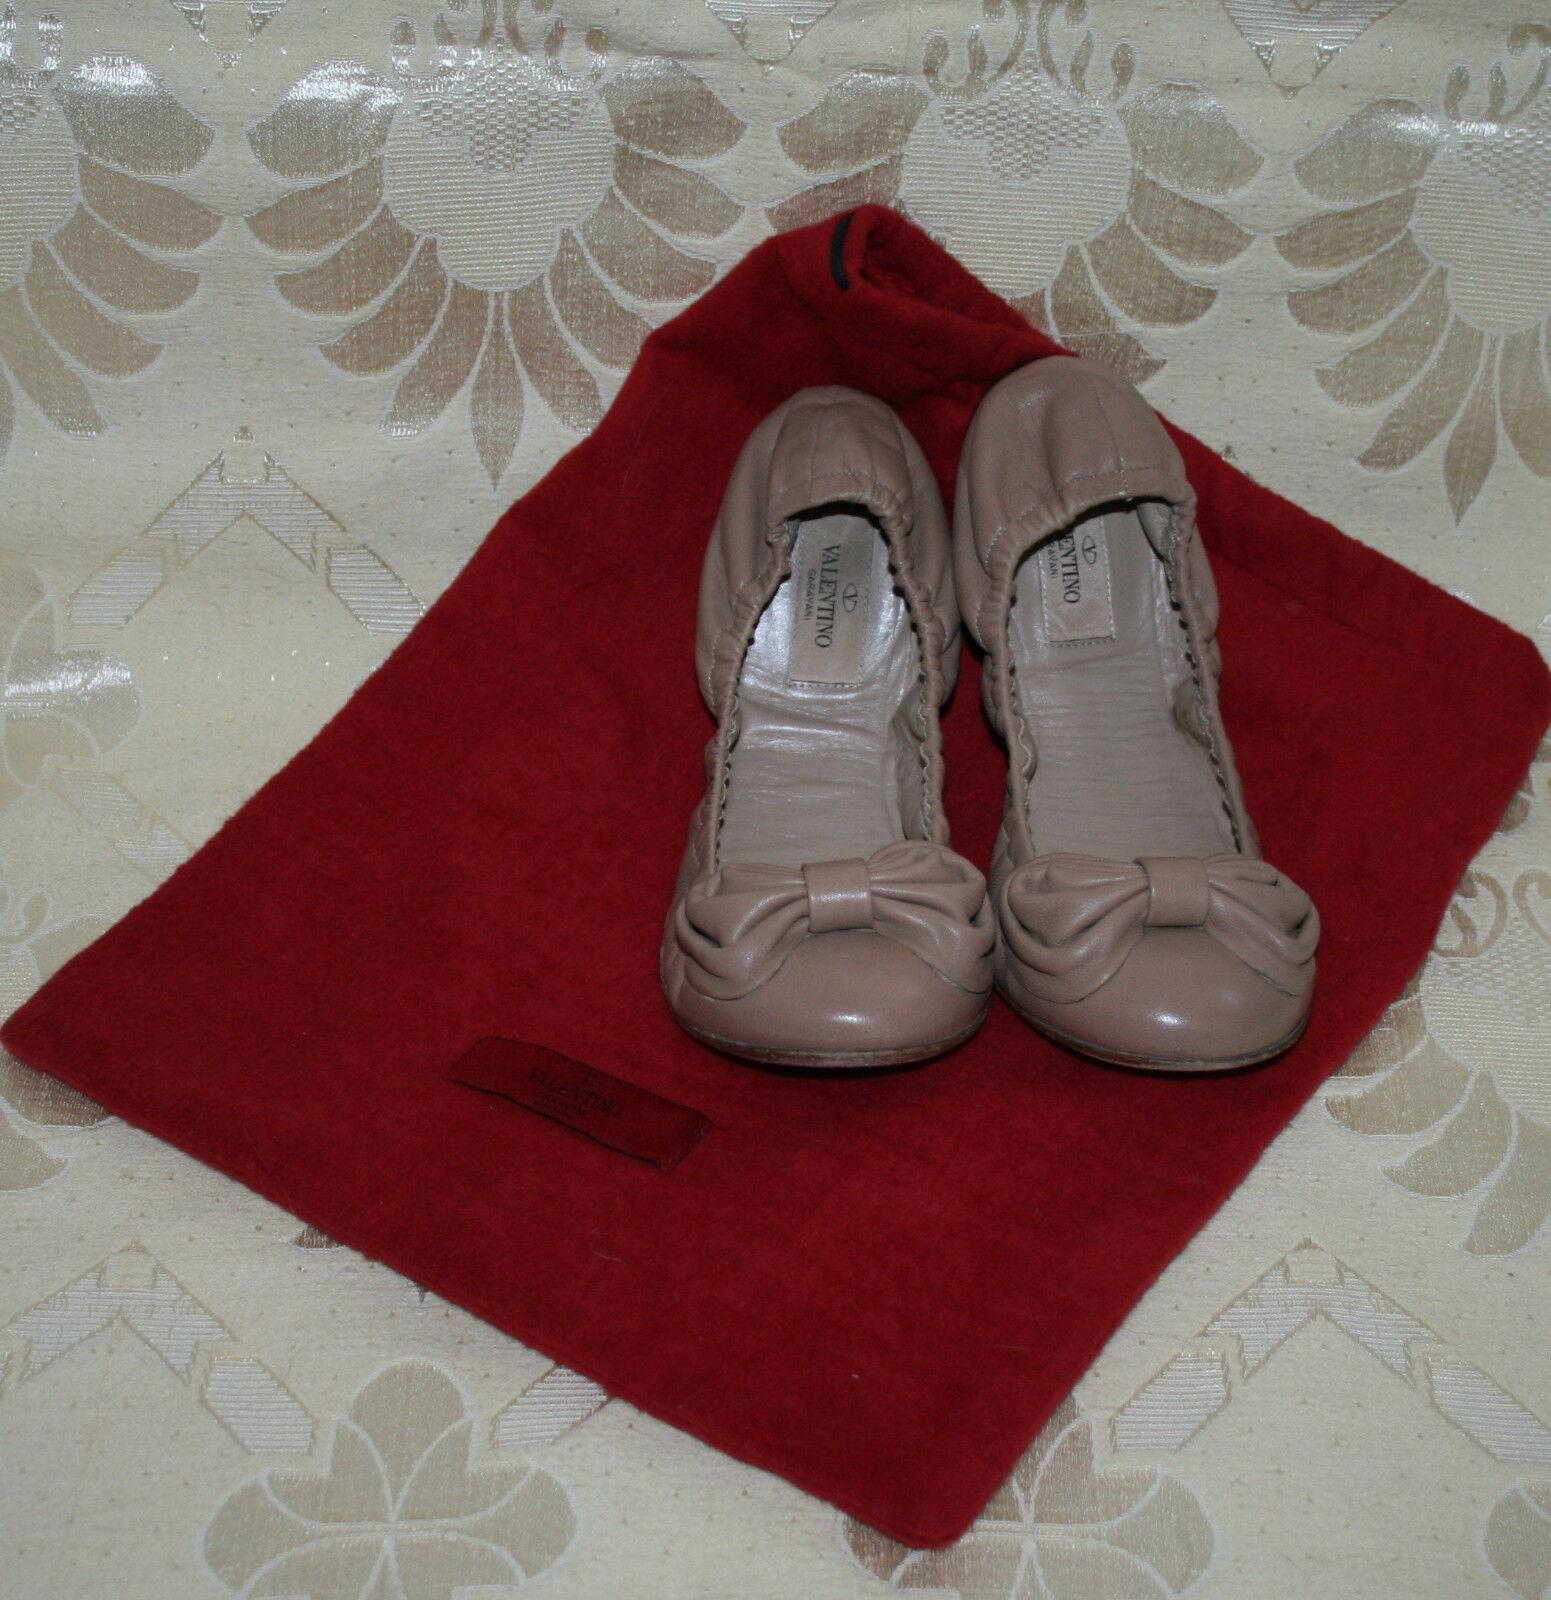 Zauberhafte Ballerinas Valentino Garavani Ballerinas Zauberhafte Flats so pretty Schleife Leder 39,5 015060